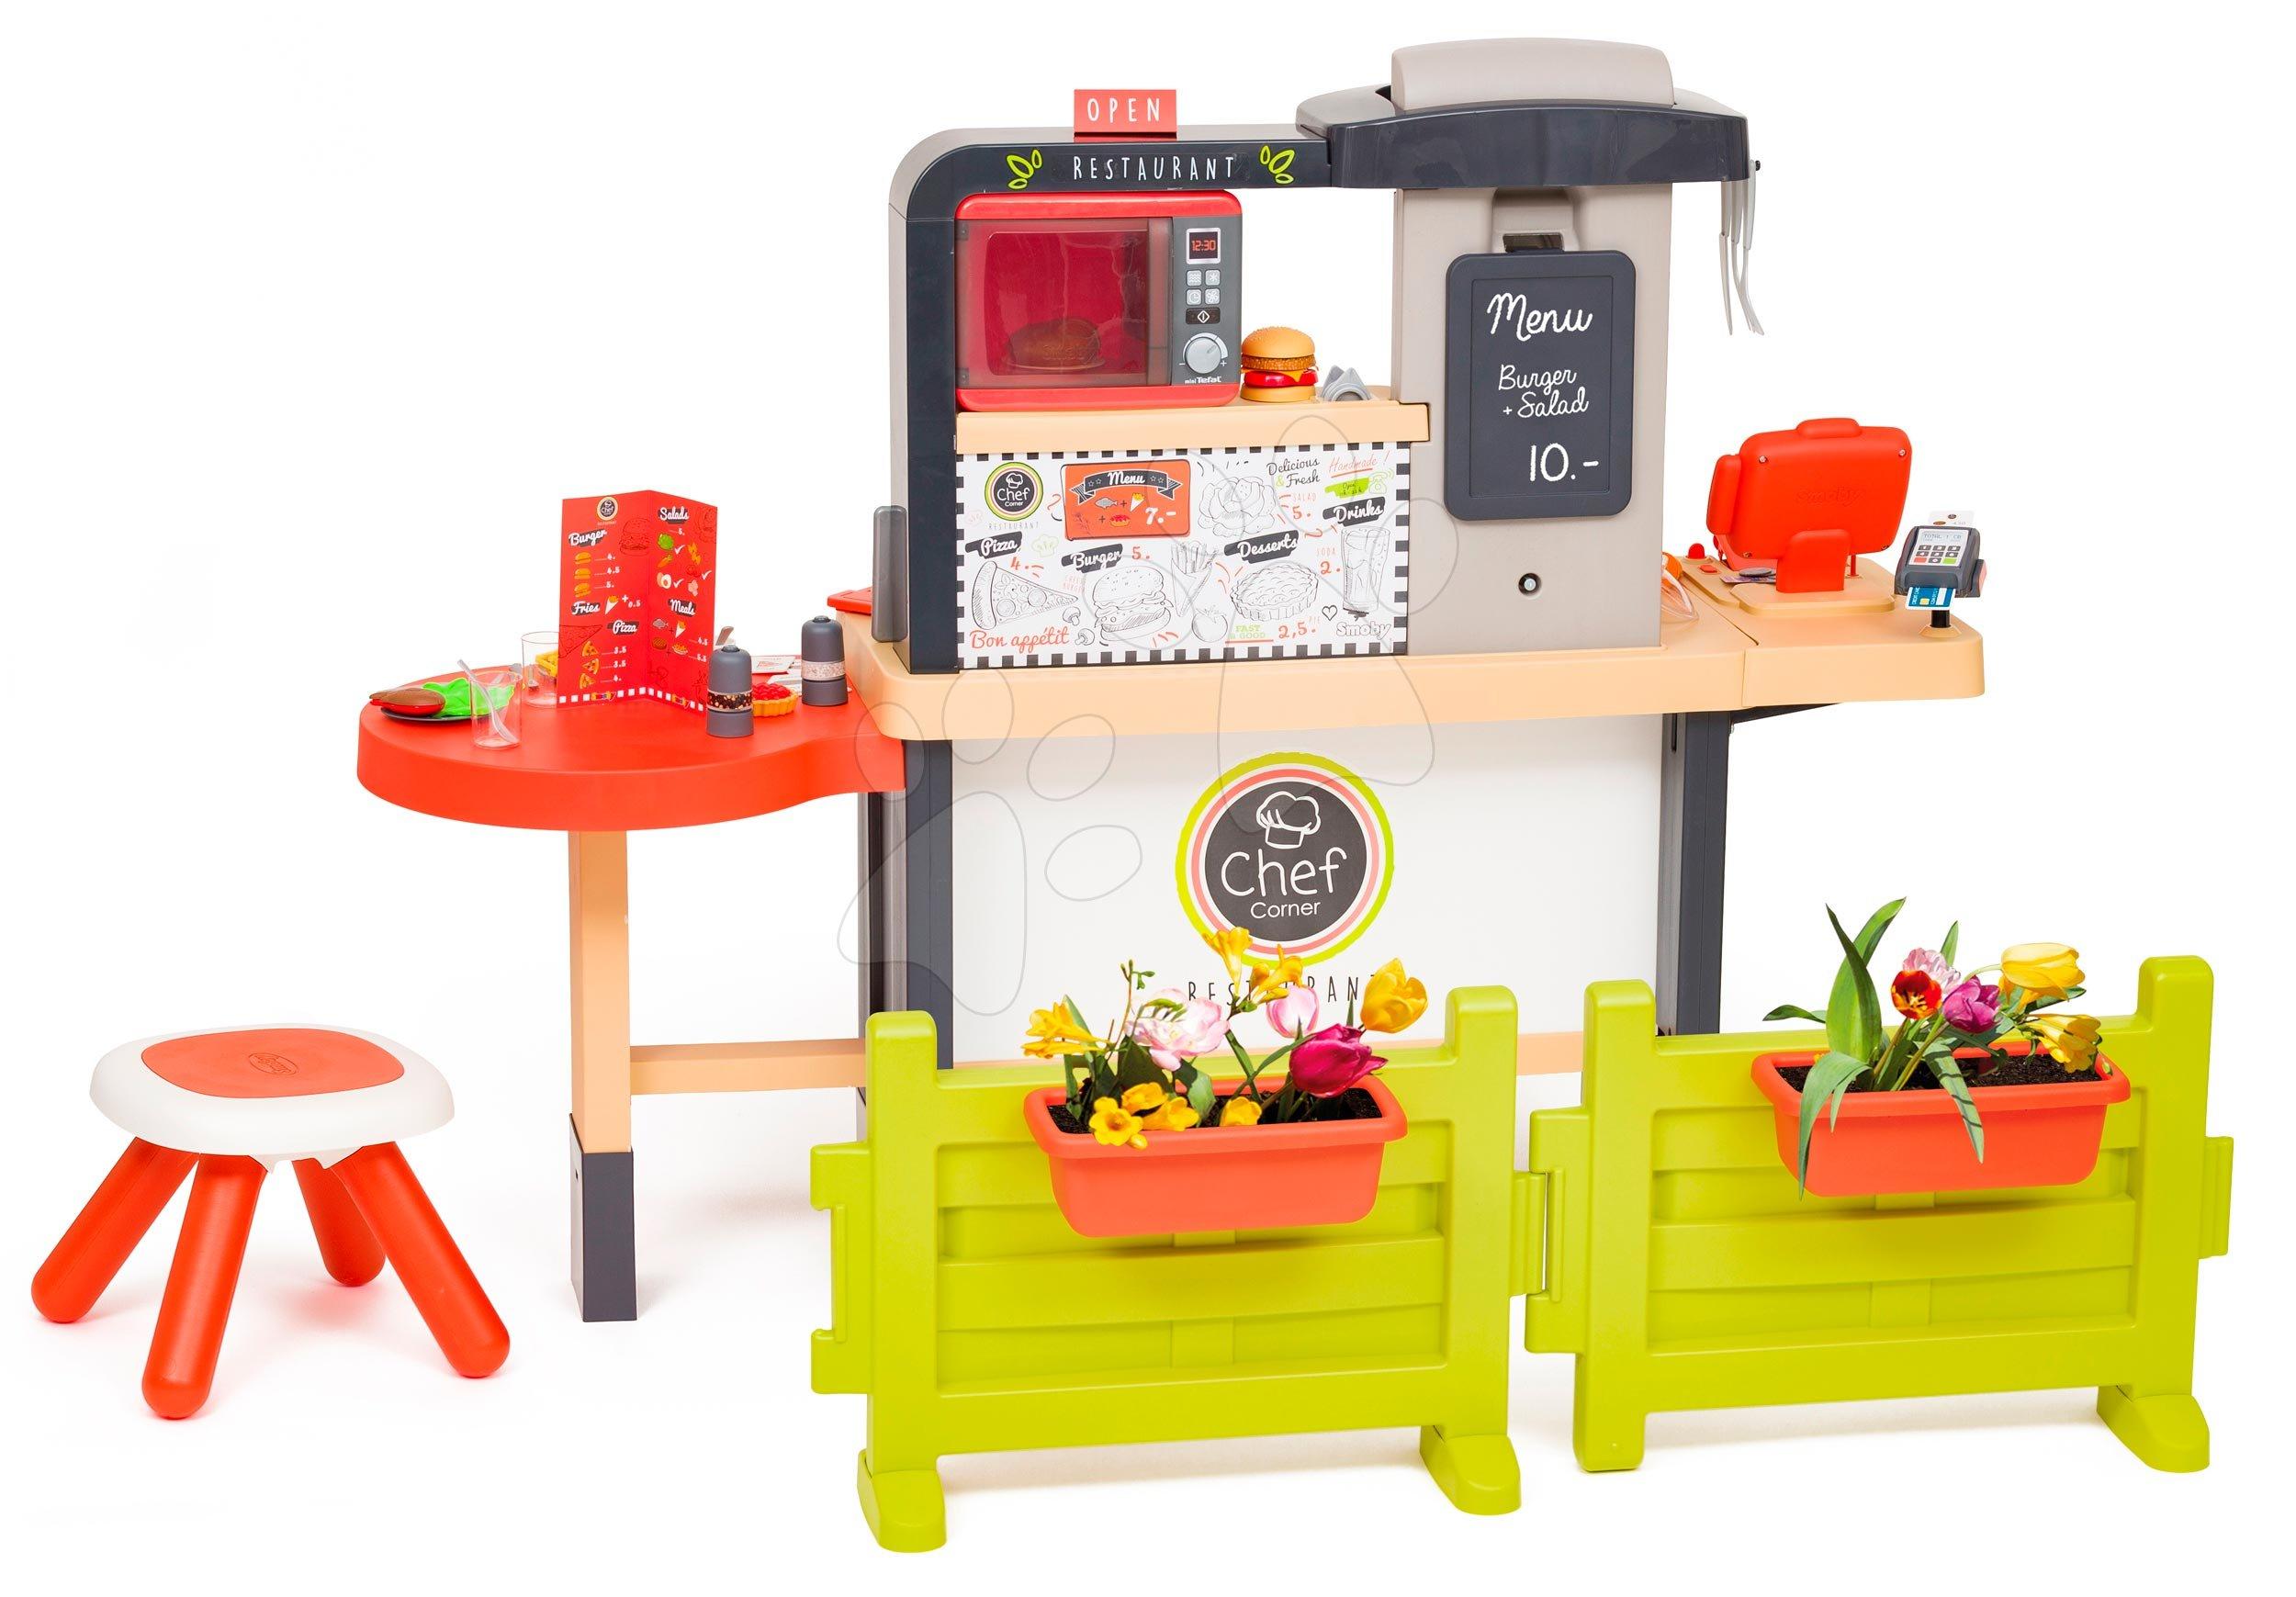 Elektronické kuchynky - Reštaurácia s elektronickou kuchynkou Chef Corner Restaurant Smoby s plotom a mikrovlnkou